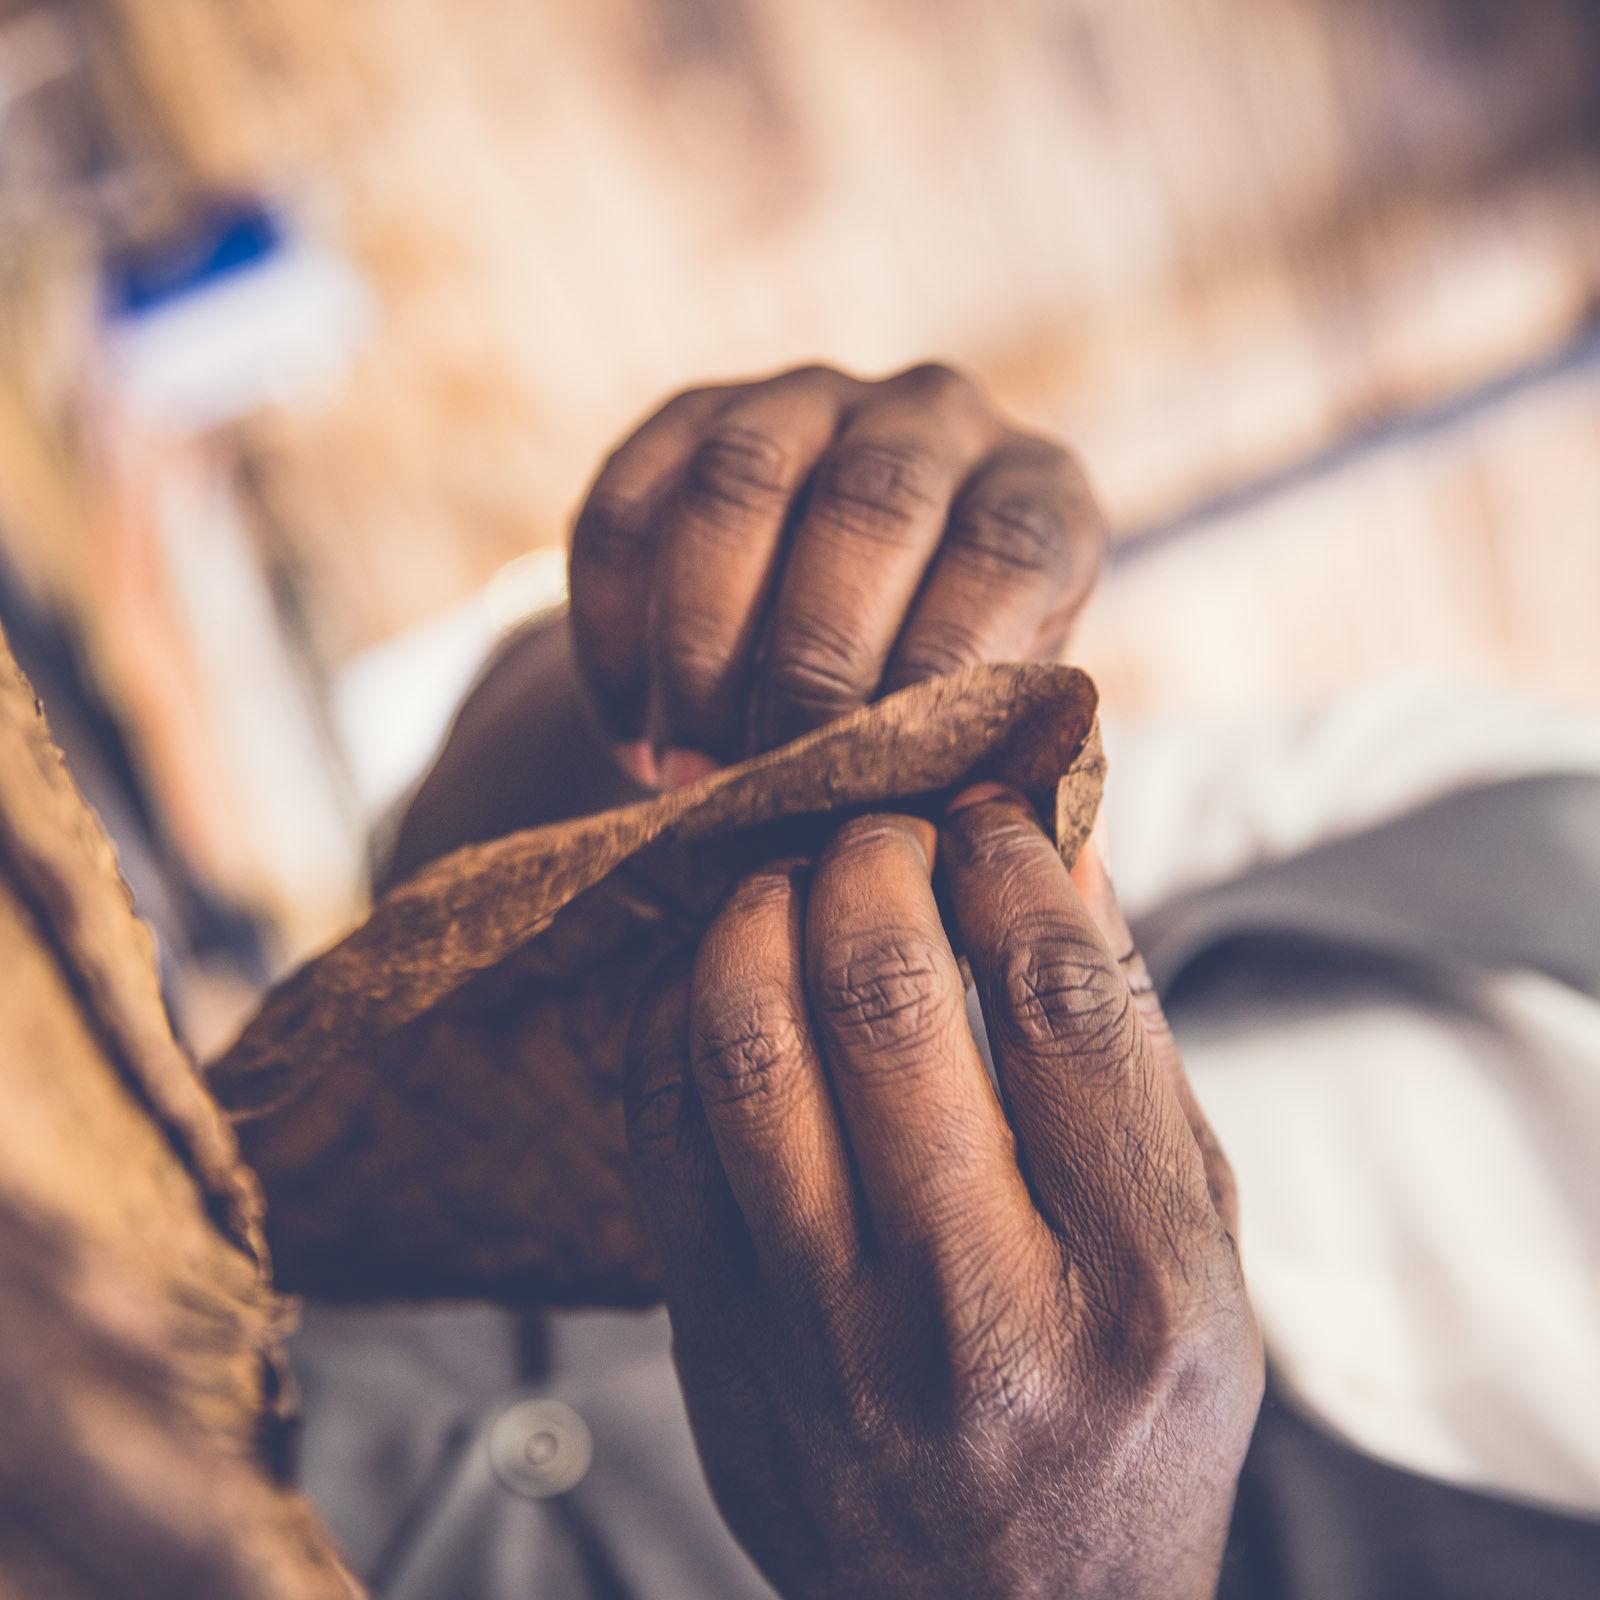 Zigarrendreher | Zigarrenroller | Zigarrenrollerin | Trocadero | Kaufen | Shop | Buchen | Mieten | Handgemacht | Zigarren | Churchill | Robusto | Corona | Robusto | Banderole | Bauchbinde | drehen | Tabak | Cuba | Brasilien